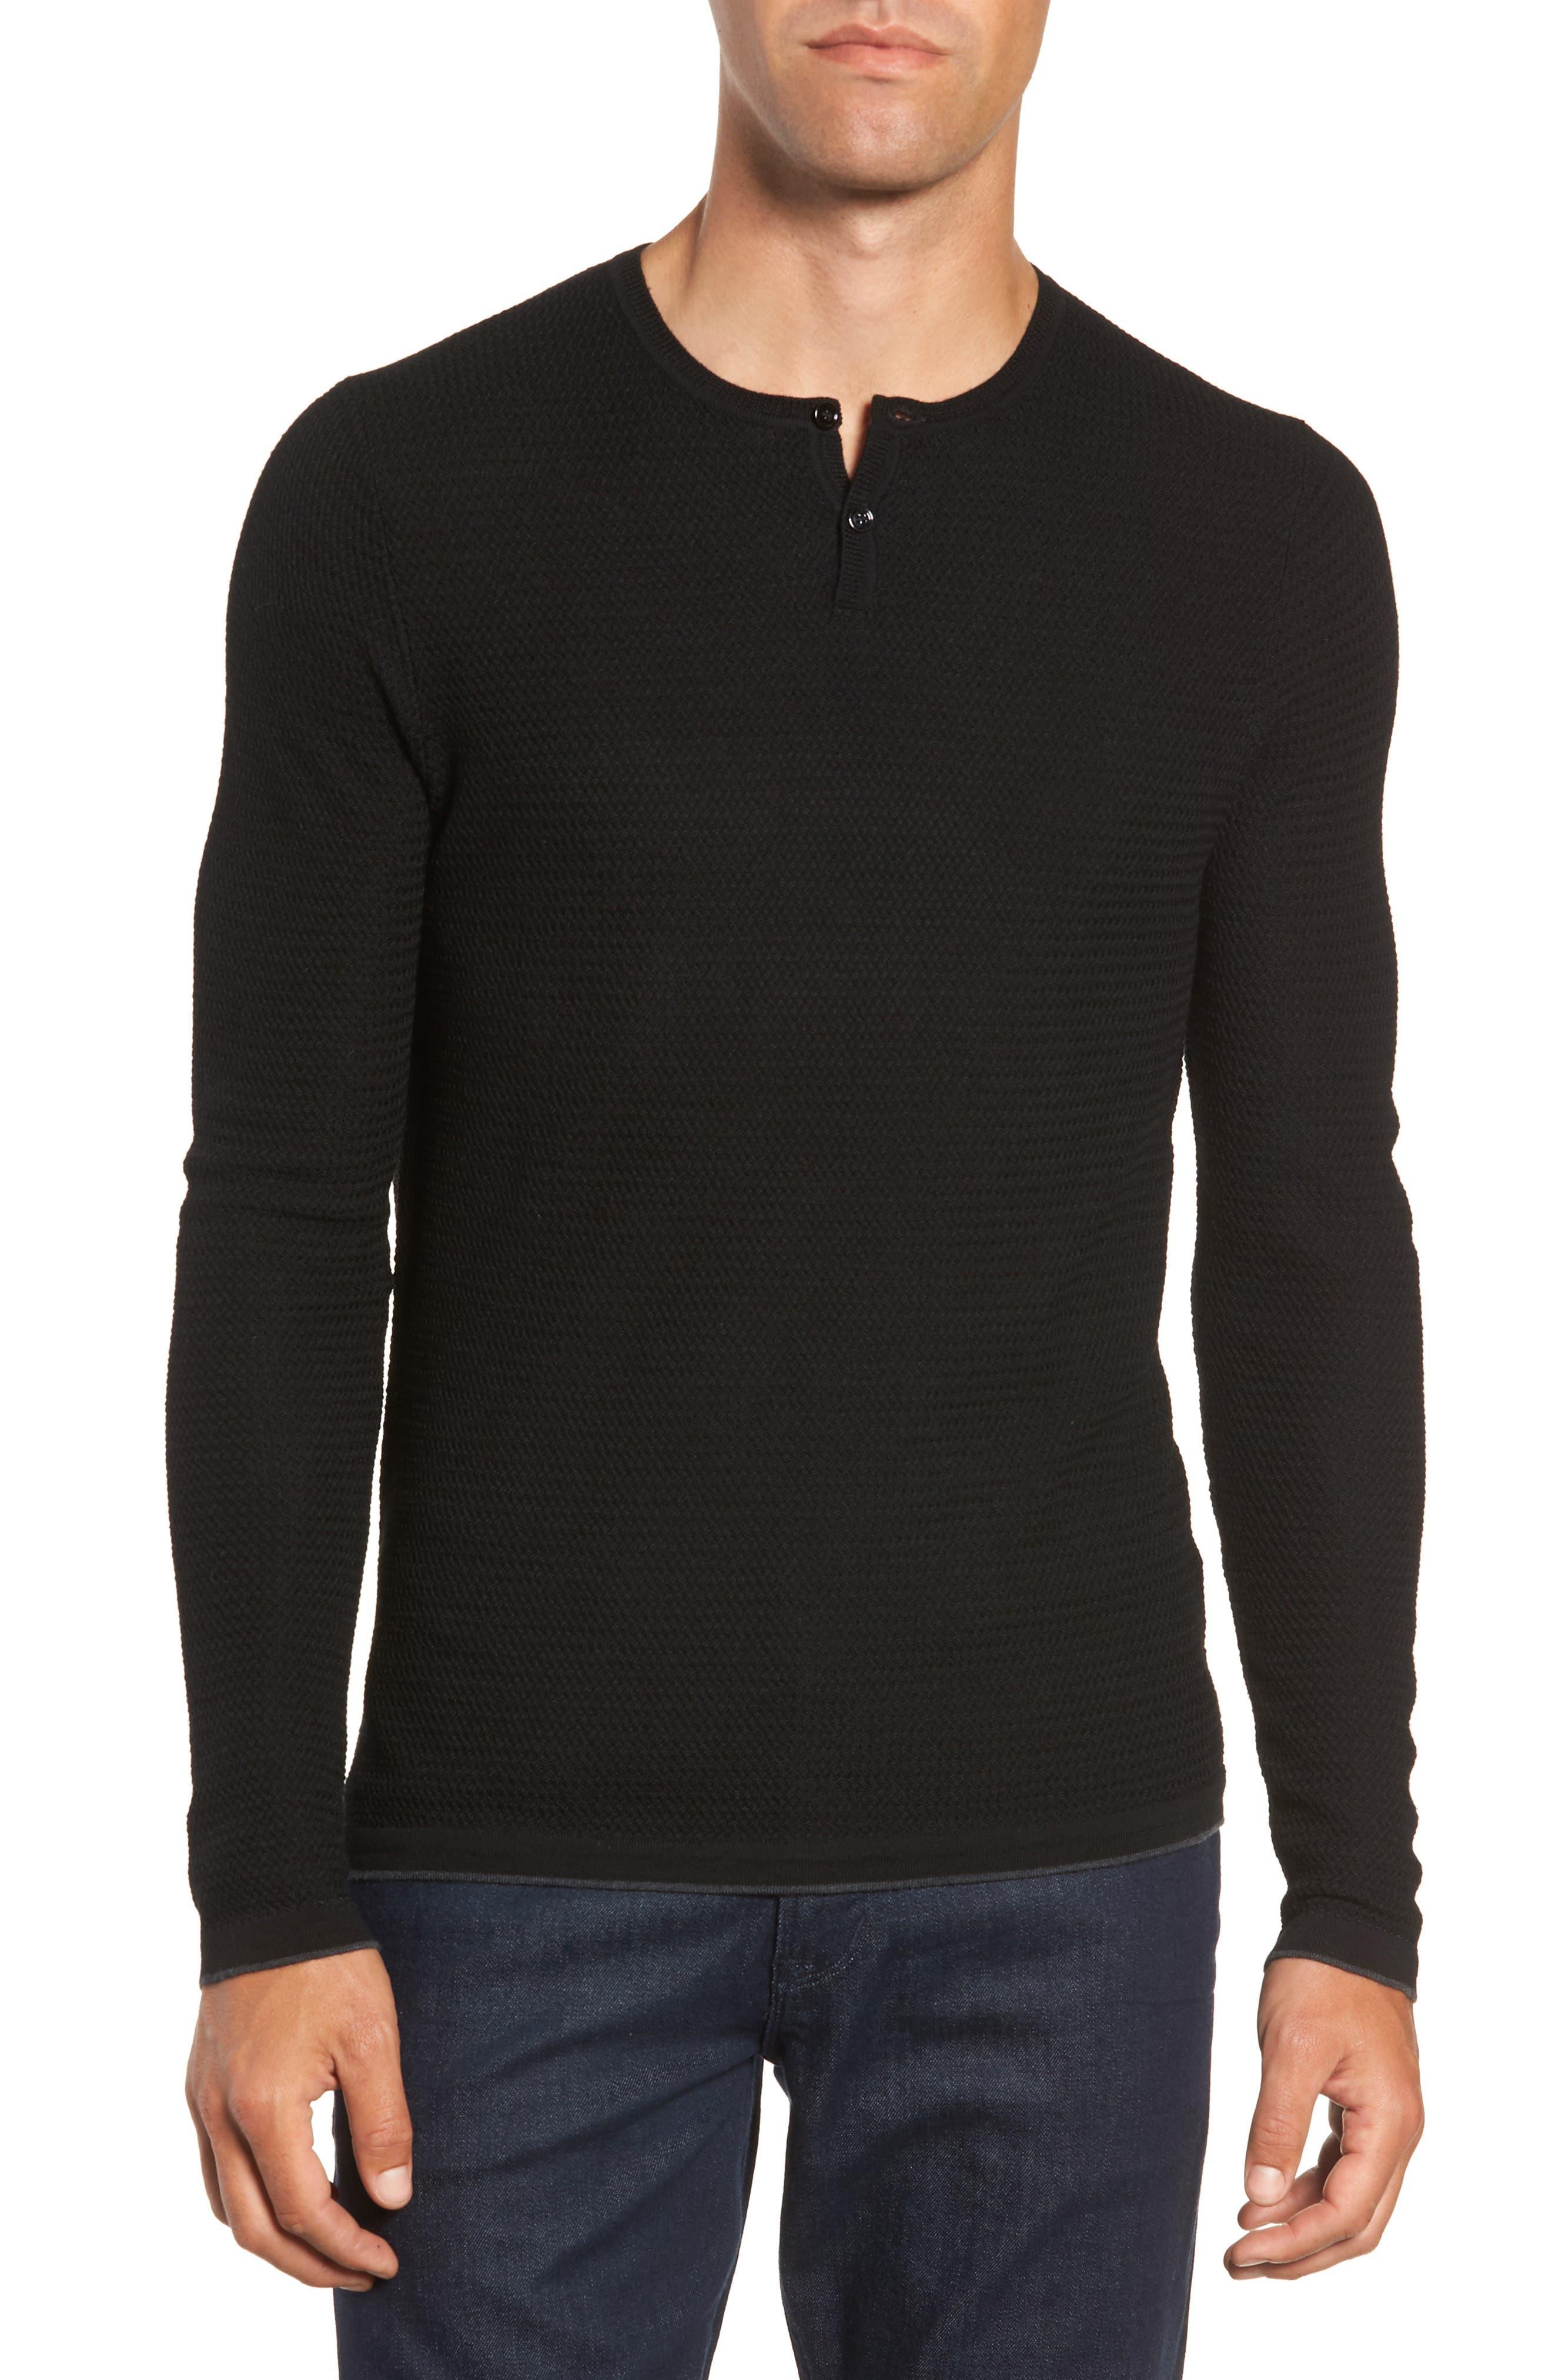 Hawthorn Wool Blend Thermal,                             Main thumbnail 1, color,                             BLACK